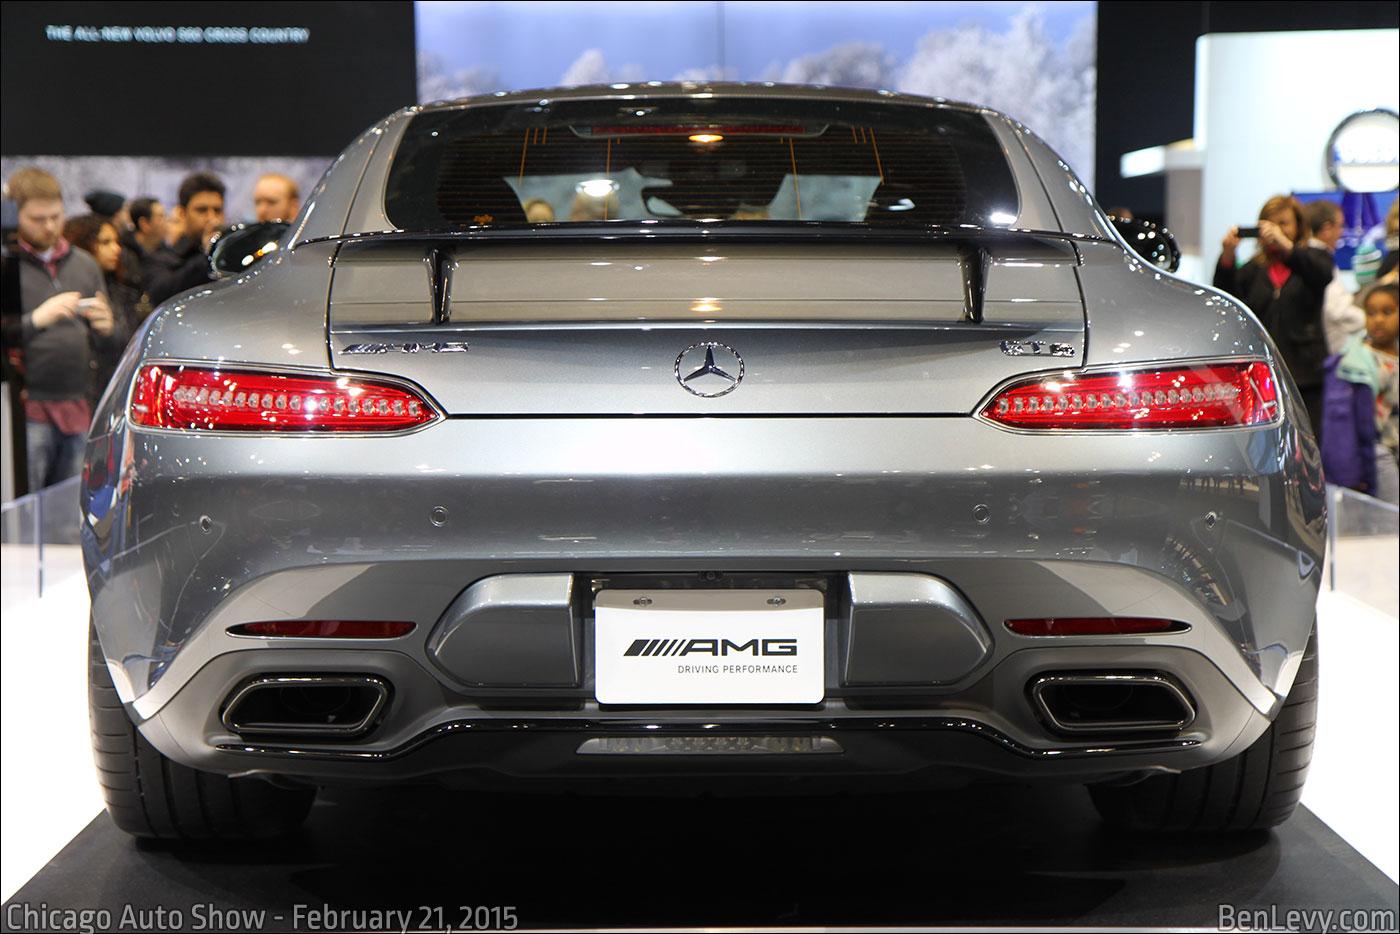 Rear shot of the Mercedes-Benz GTS